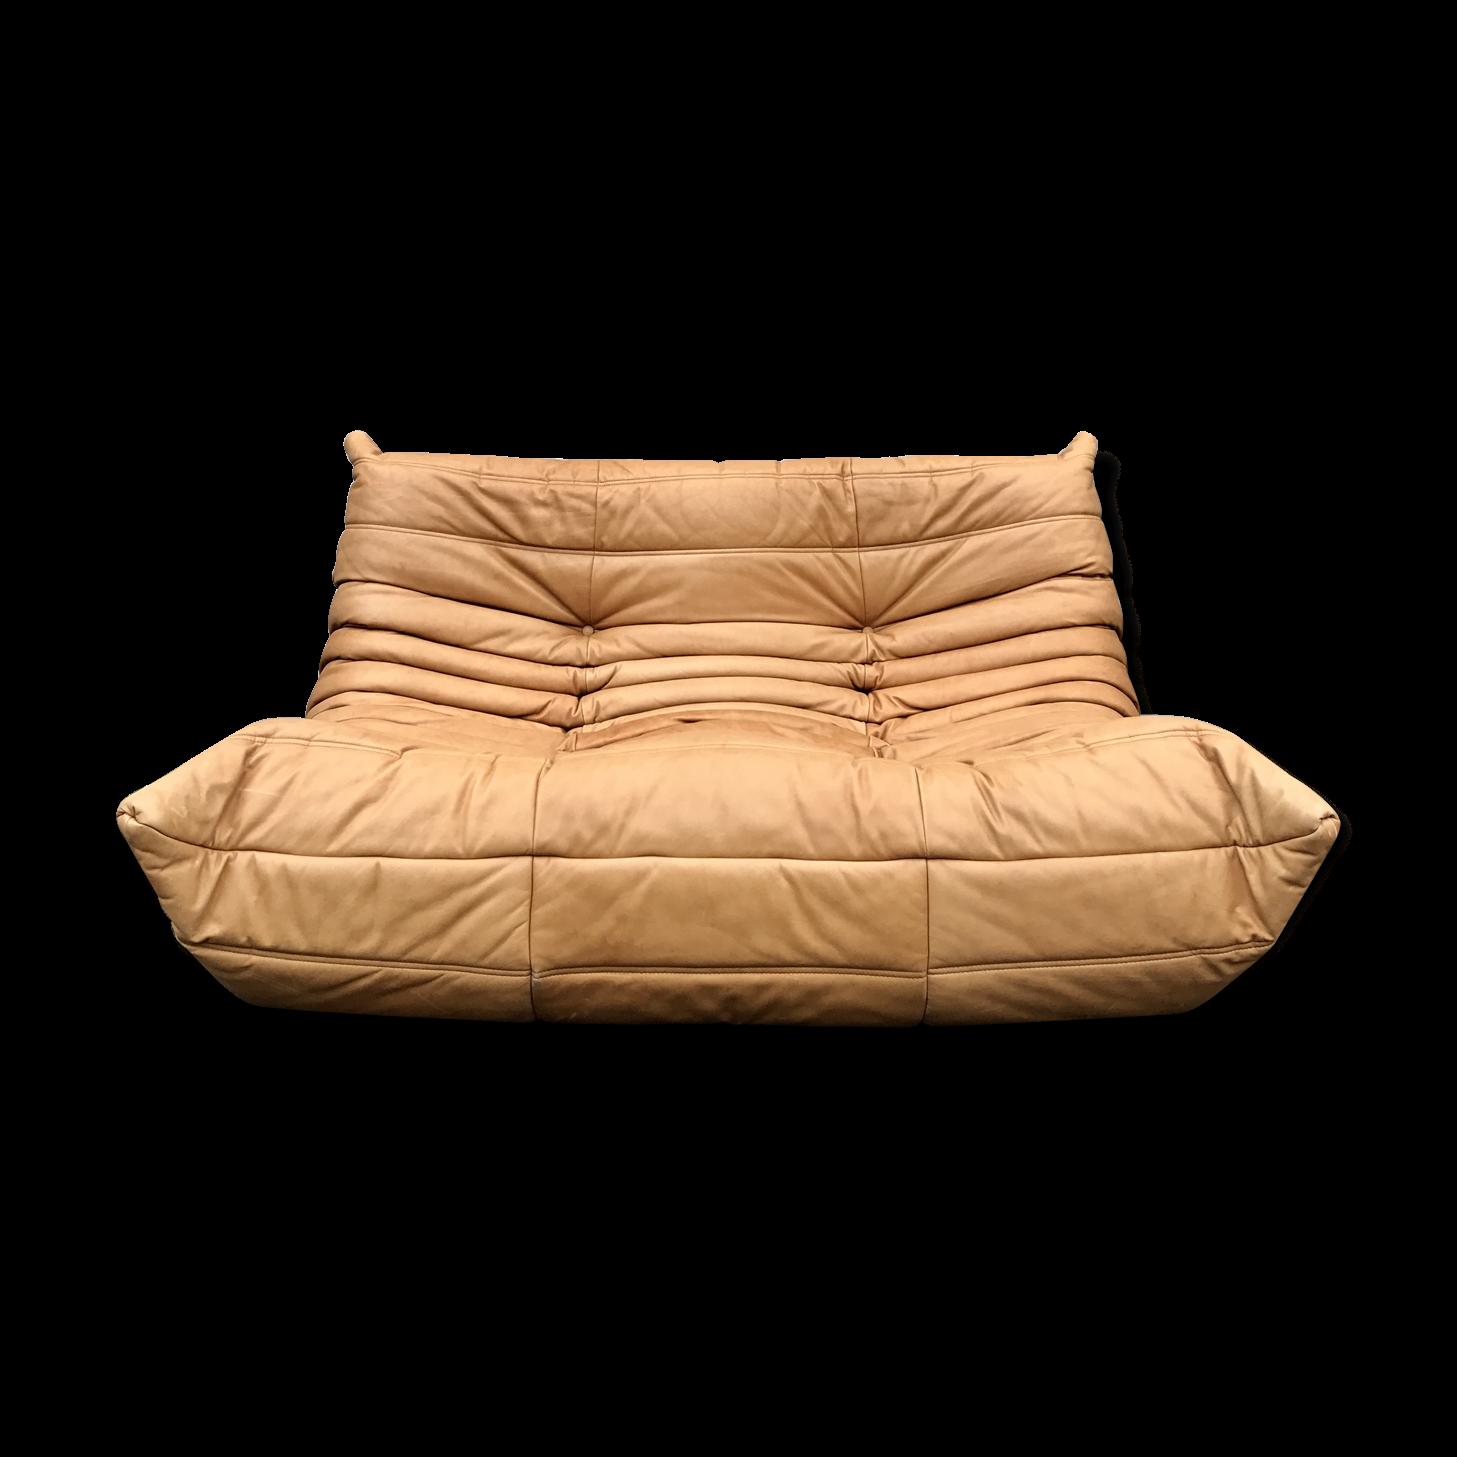 banquette togo latest previous with banquette togo trendy fauteuil togo vintage en cuir bleu. Black Bedroom Furniture Sets. Home Design Ideas